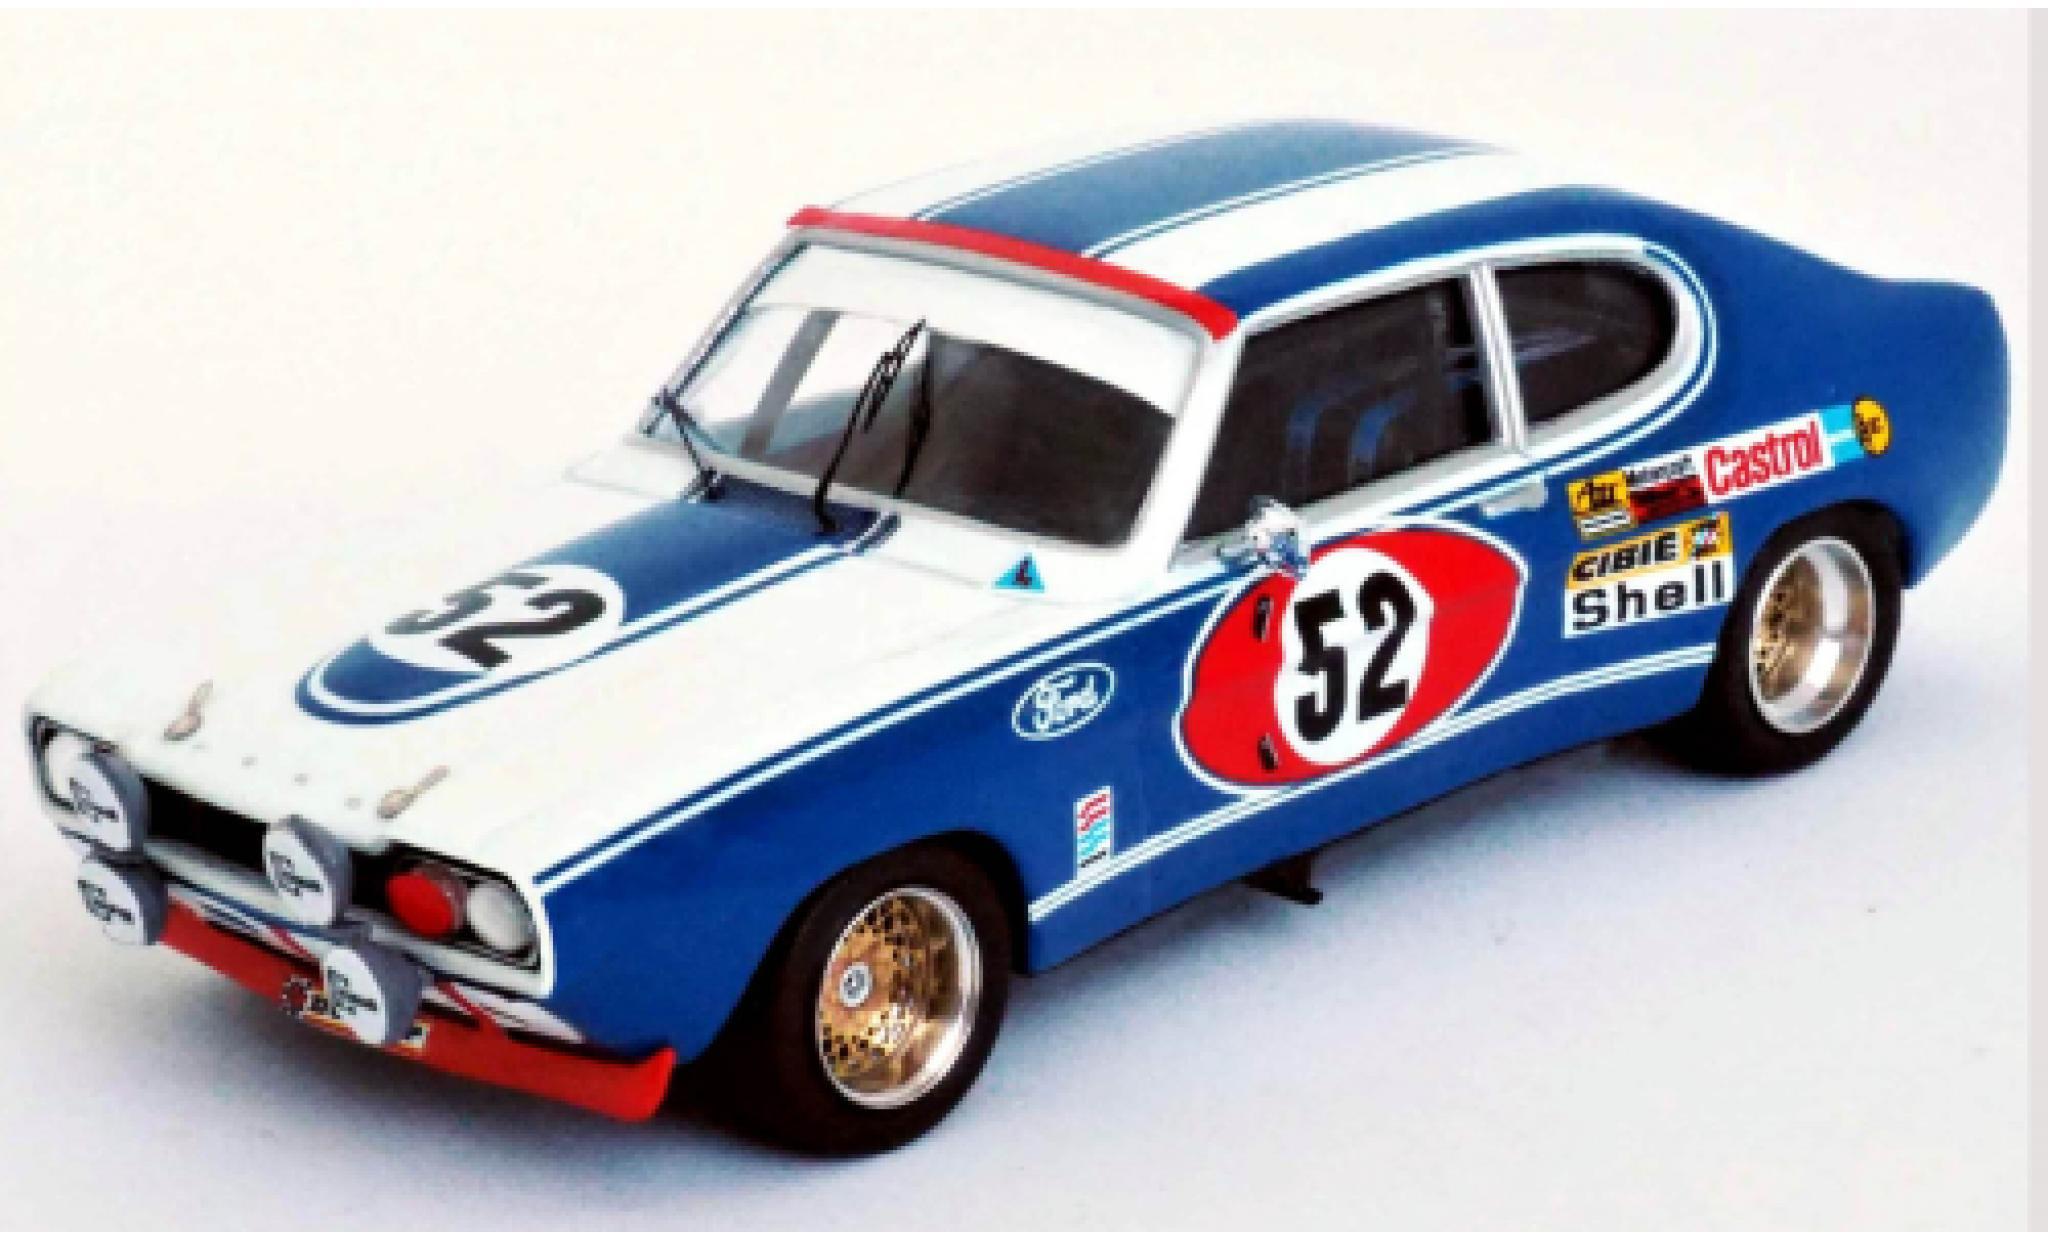 Ford Capri 1/43 Trofeu MkI 2600 RS No.52 Motor Company Deutschland 24h Le Mans 1972 D.Glemser/A.Soler-Roig